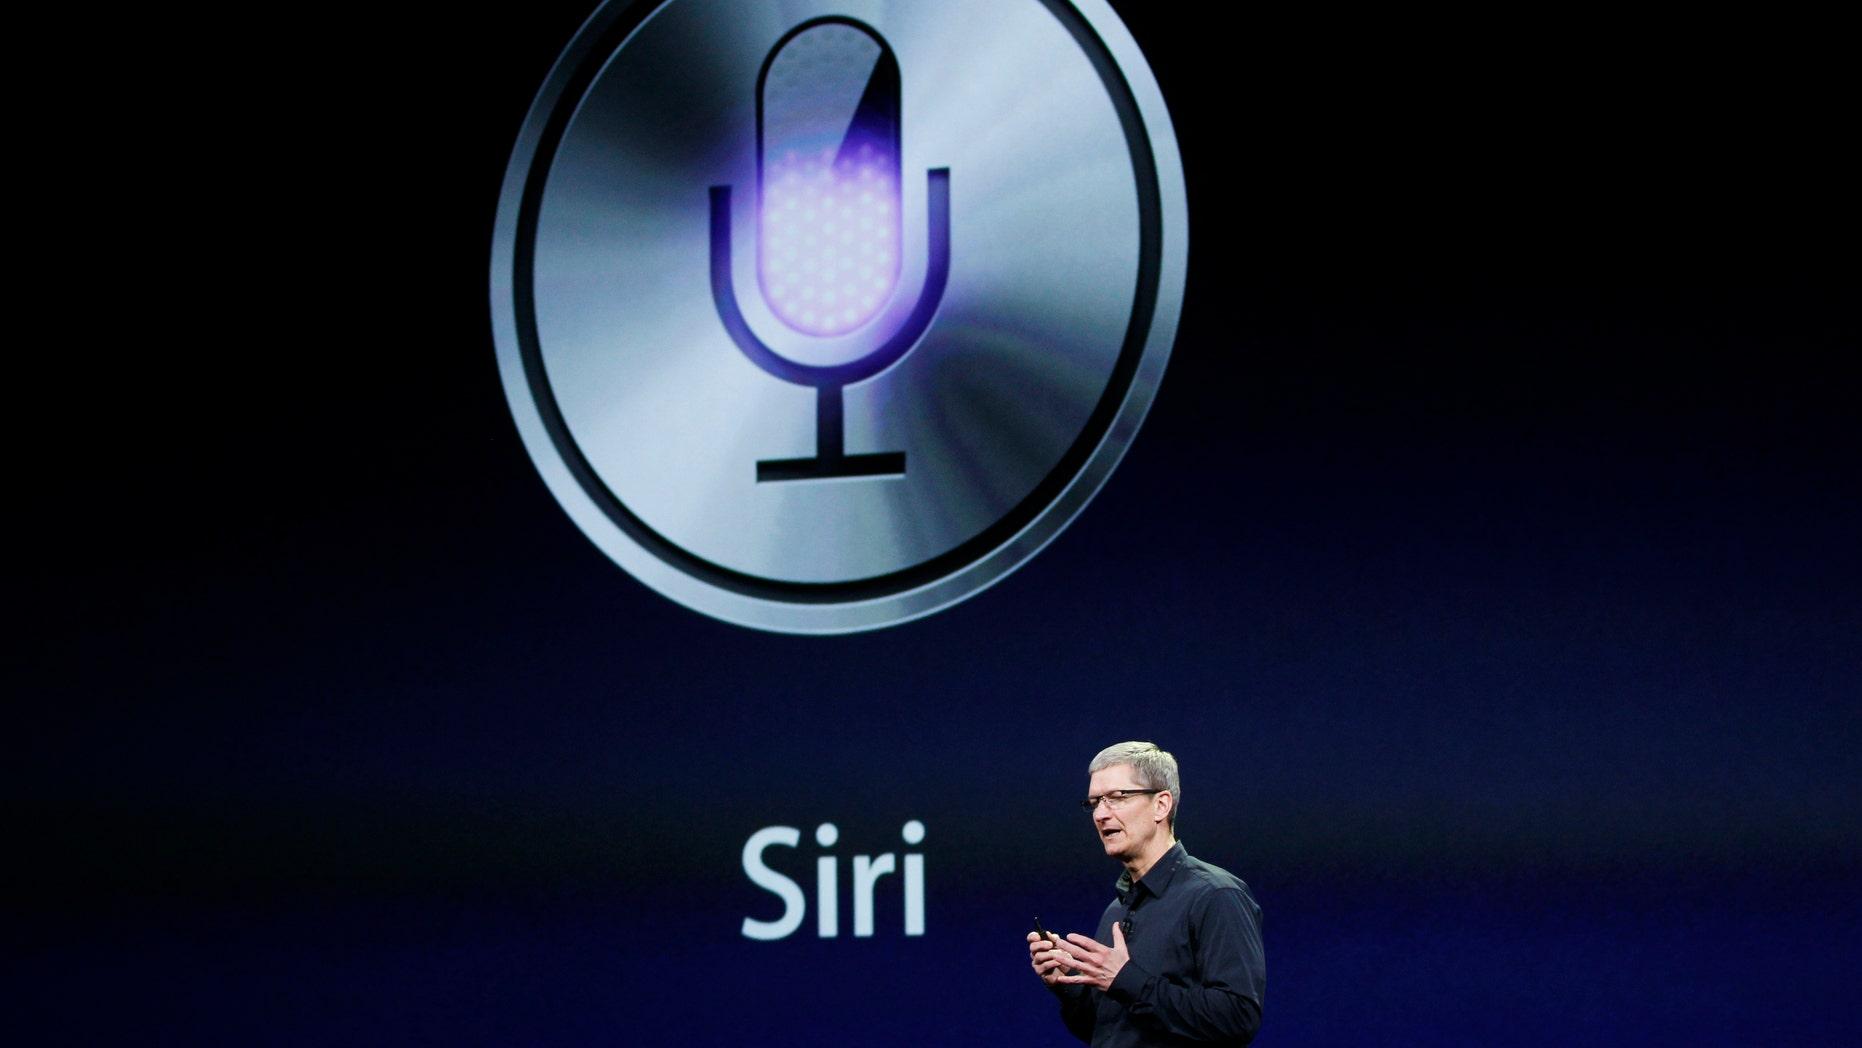 Apple CEO Tim Cook talks about Siri during an Apple event March 7, 2012. (REUTERS/Robert Galbraith)